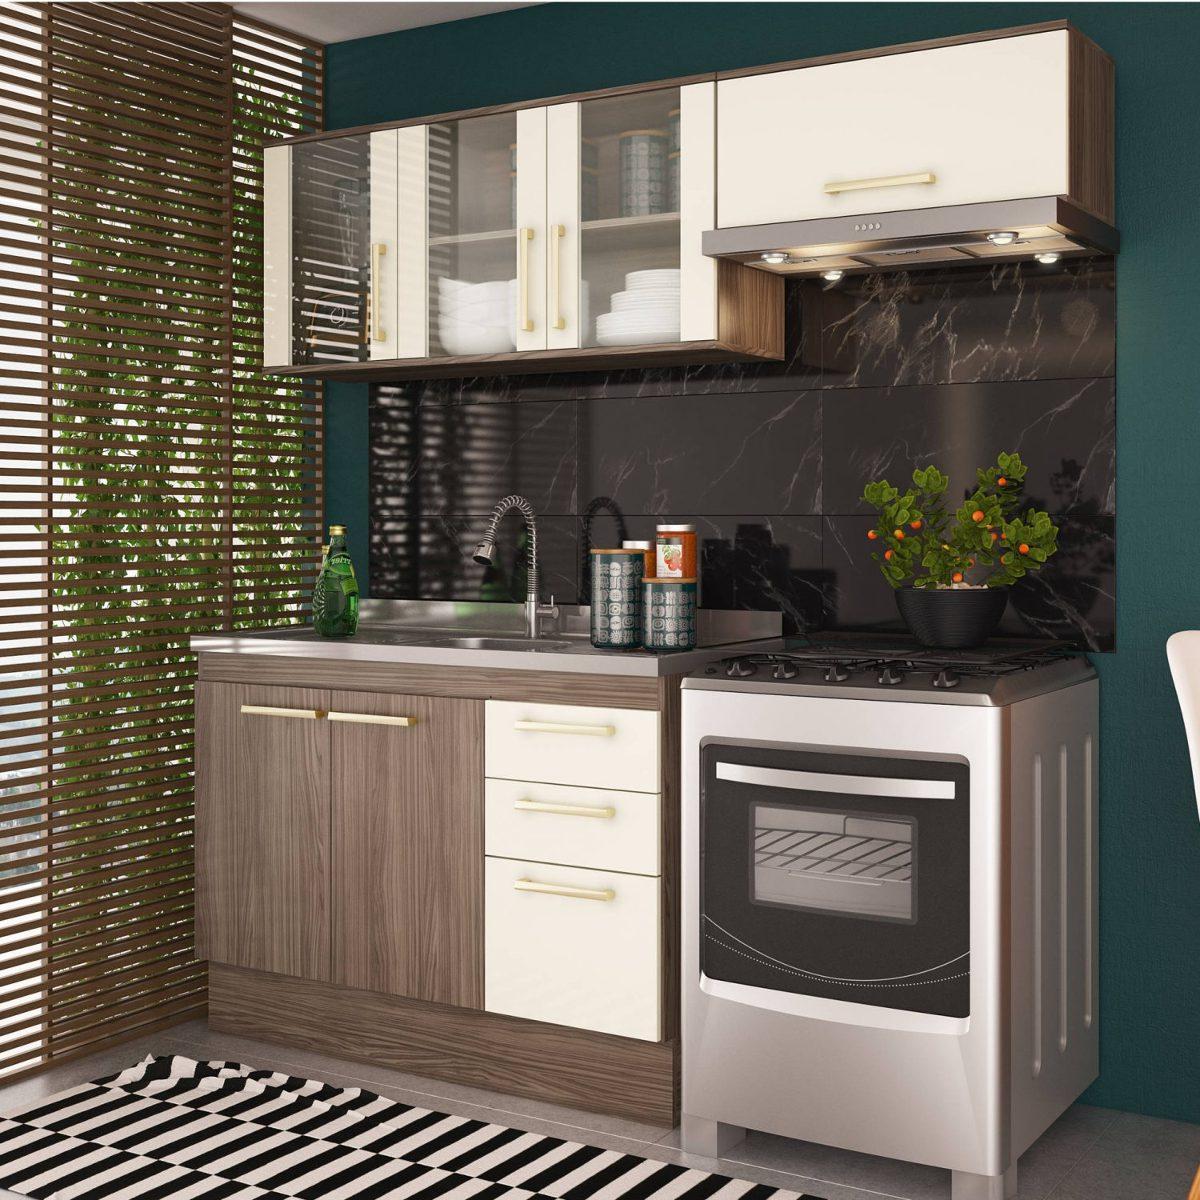 Cozinha Compacta 3 Pe As Zafira A1892 Casamia N O Cf R 559 90 Em